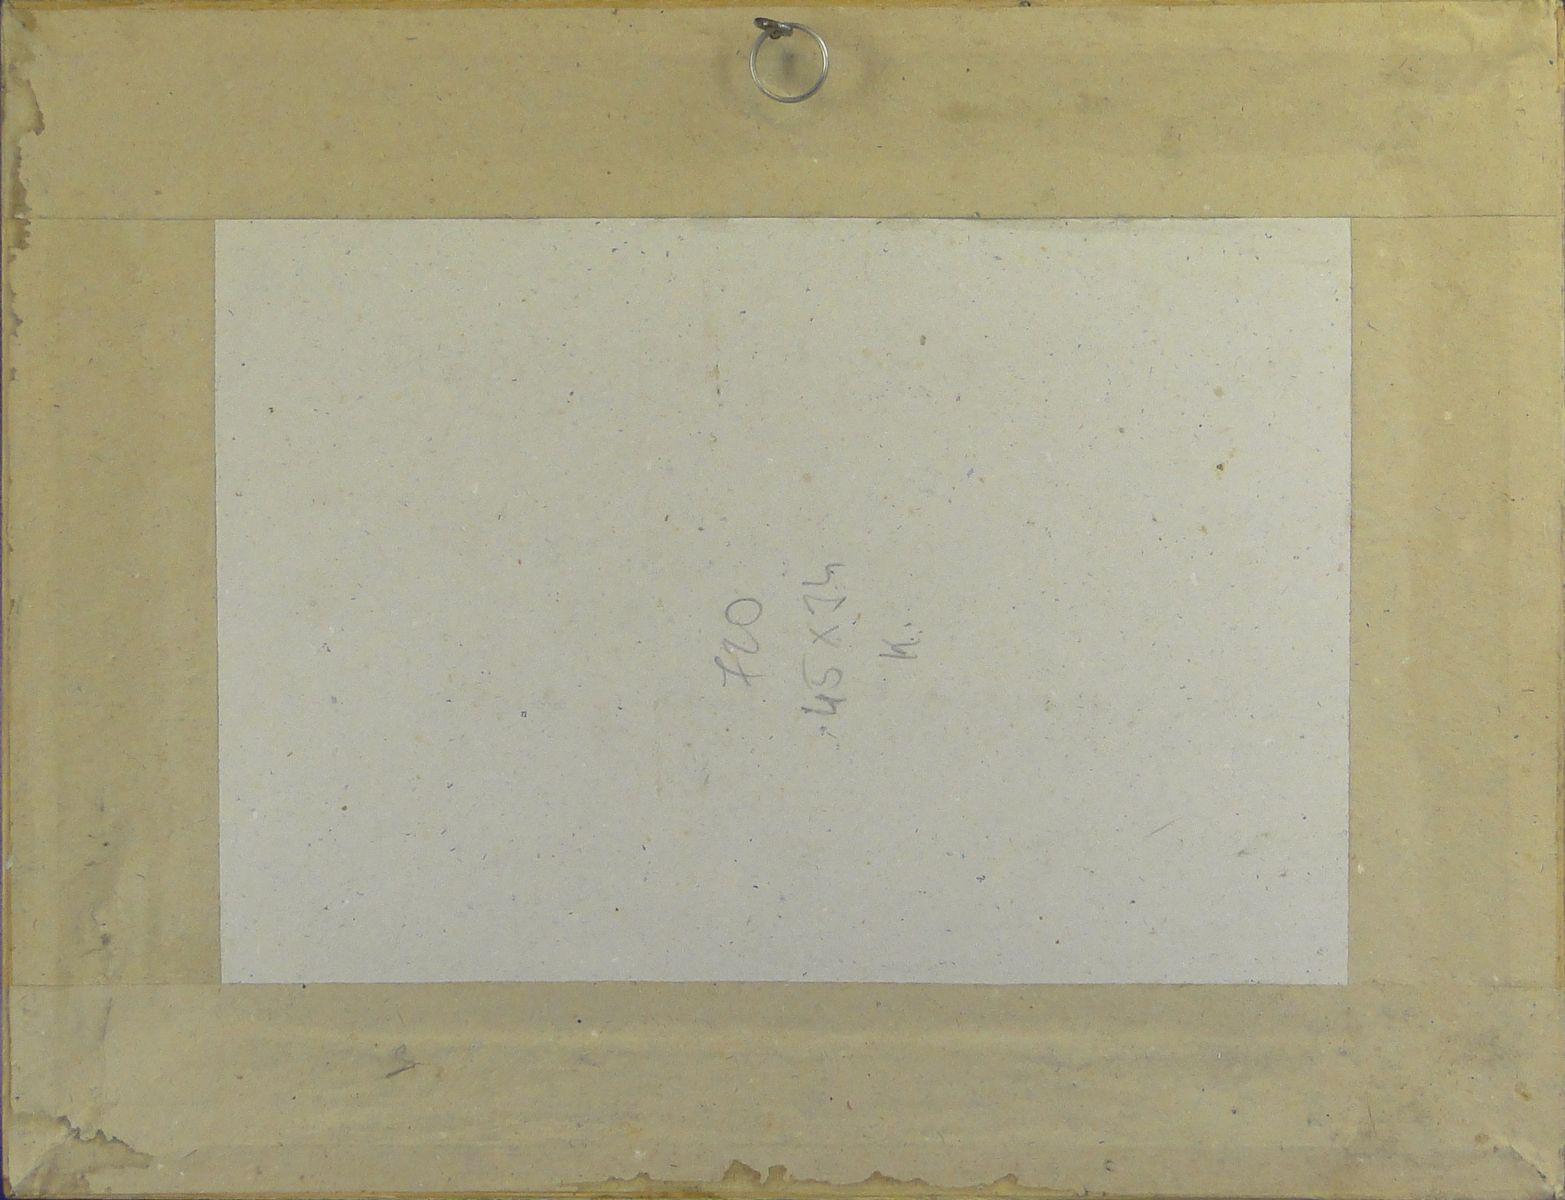 DSC00641.JPG (1565�1200)